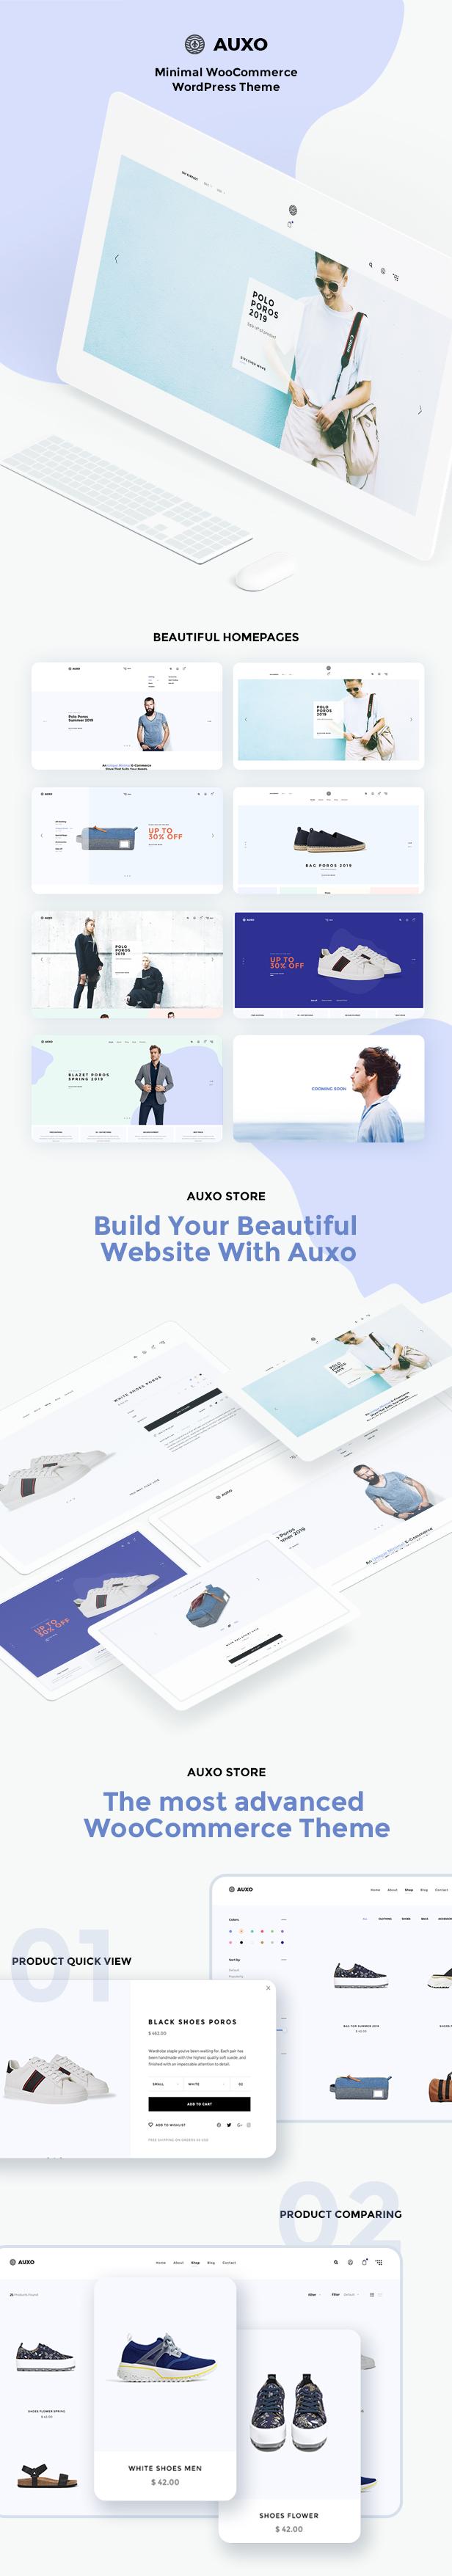 Auxo - Minial WooCommerce Shopping Thème WordPress - 9